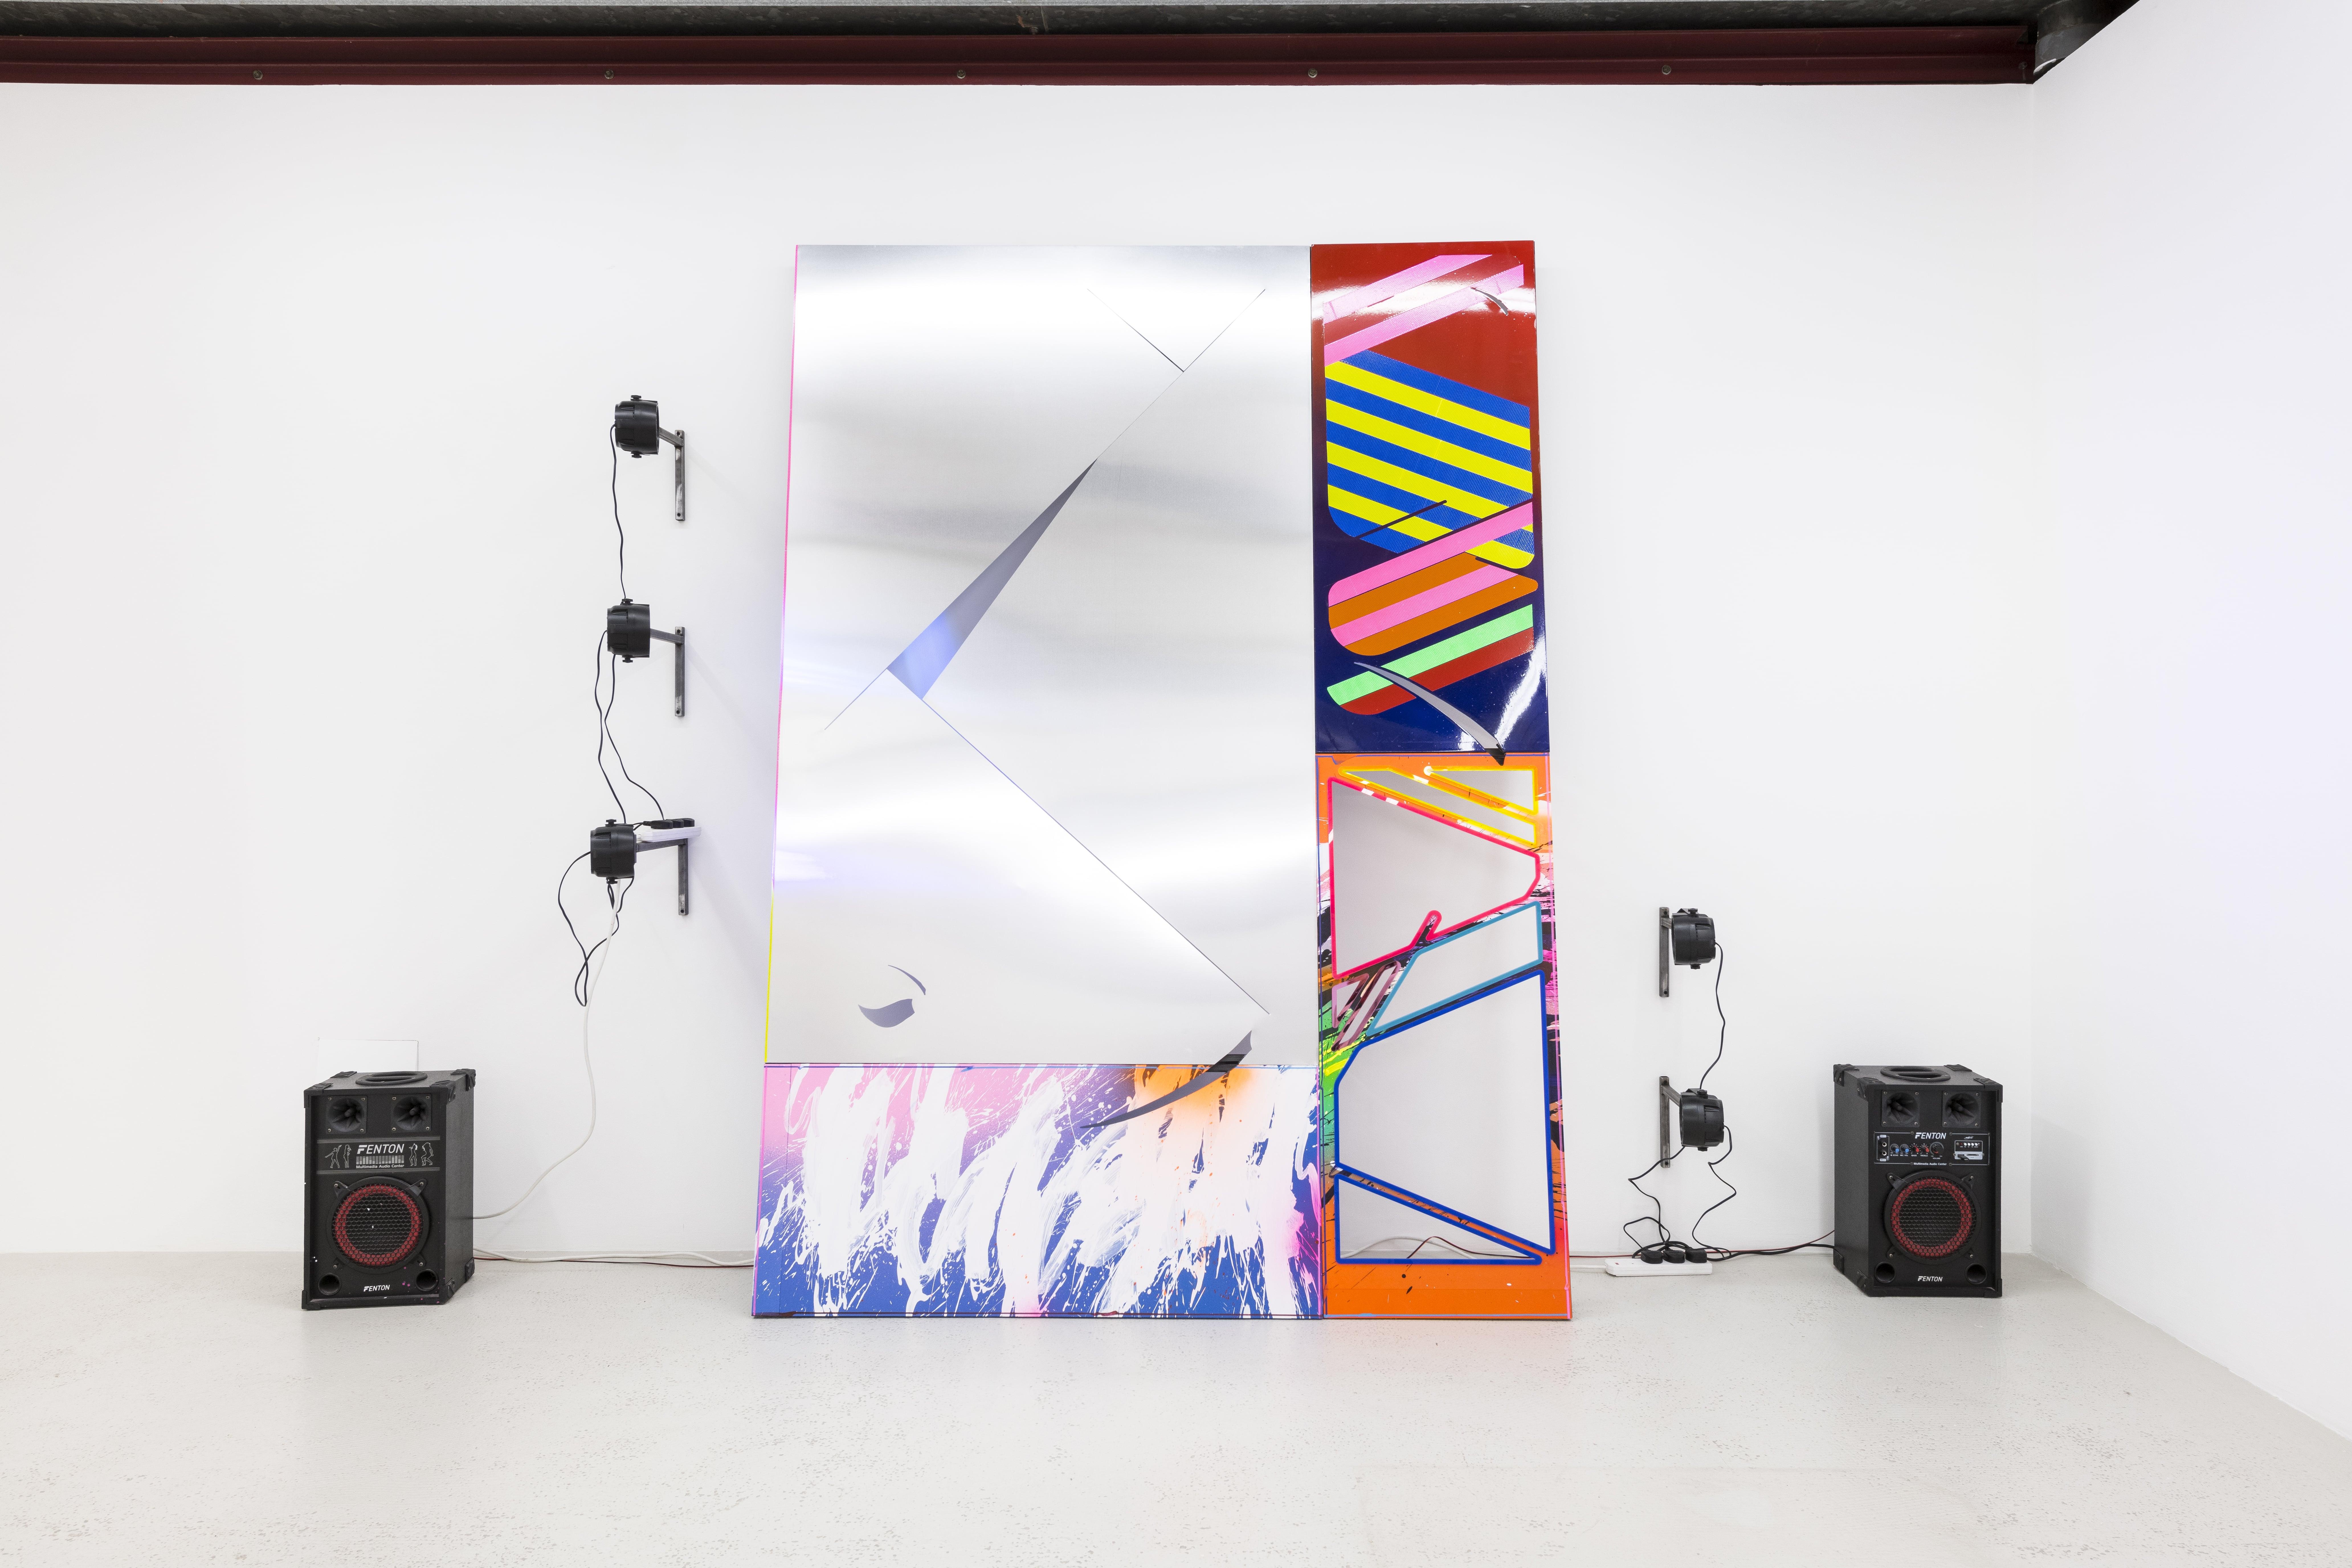 NemesM_Police-Party-02_2018_250x178cm_aluminium-steel-foamex-PVC-light-reflective-vinyl-carpaint-acrylic-dj-lights-speakers-sound-min